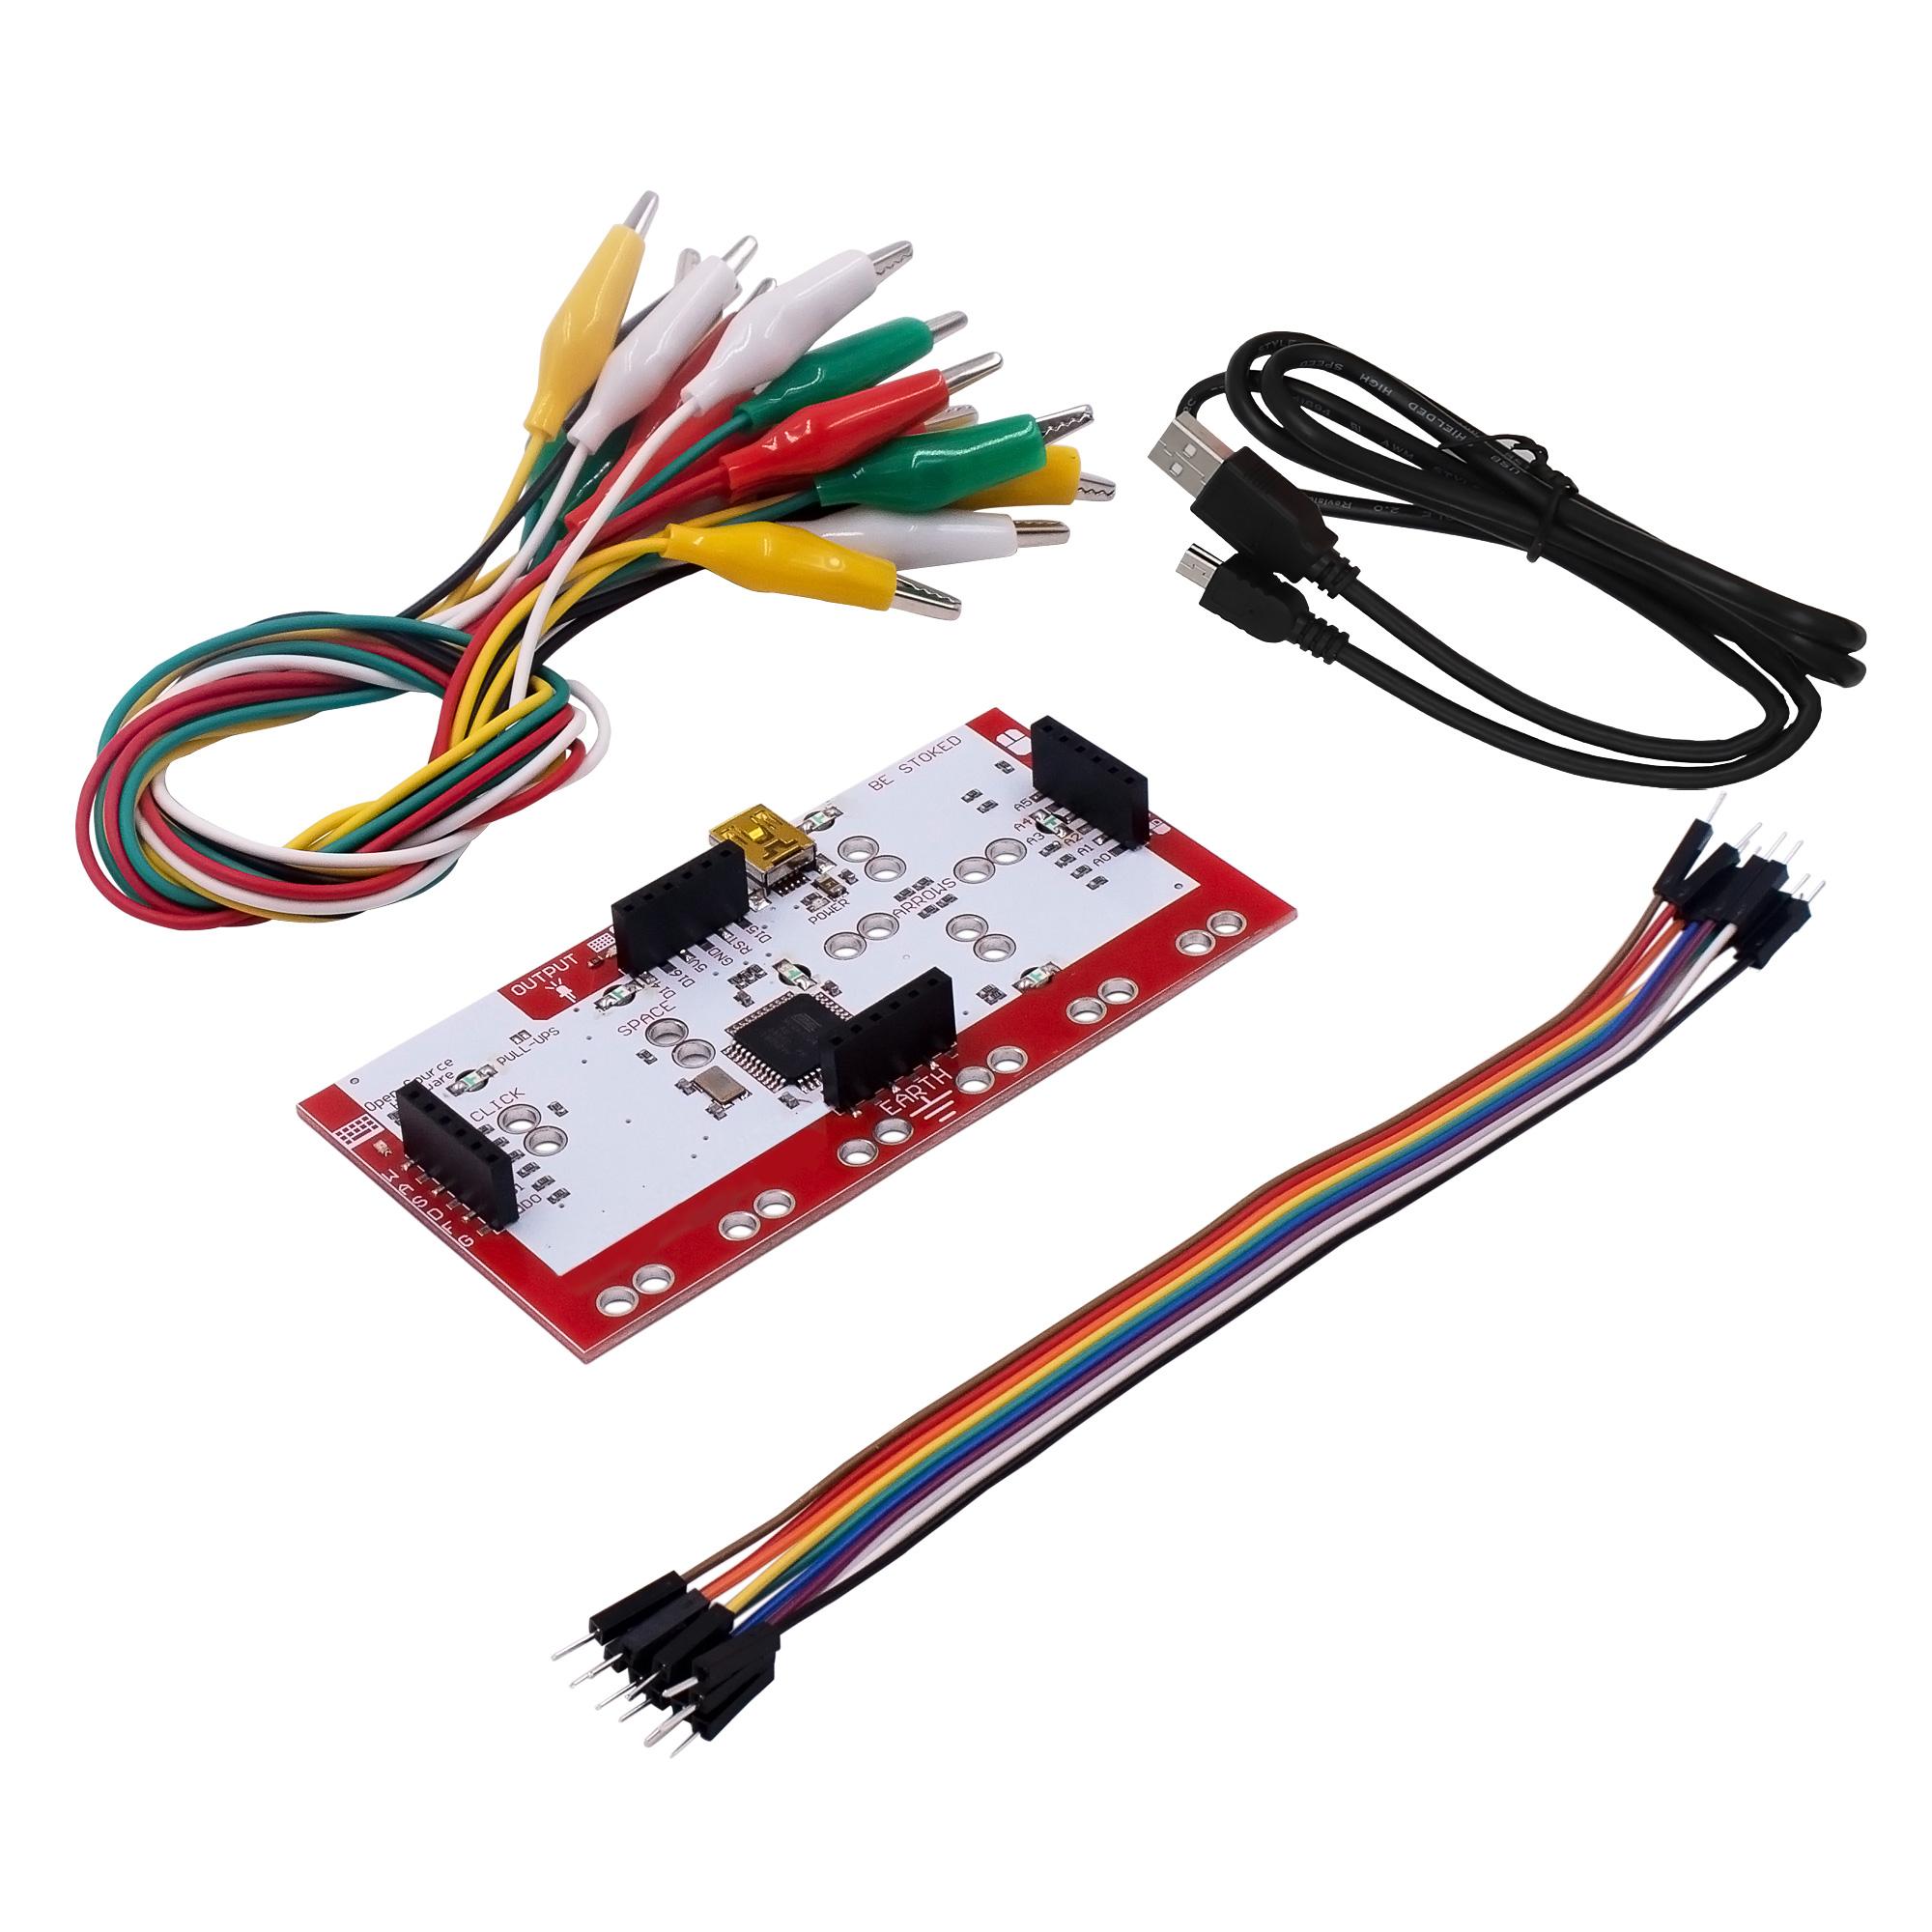 Alligator Clip Jumper Wire + Standard Controller Board DIY Kit + USB Cable for Makey, UNO R3, Mega 2650, Nano for Child's Gift